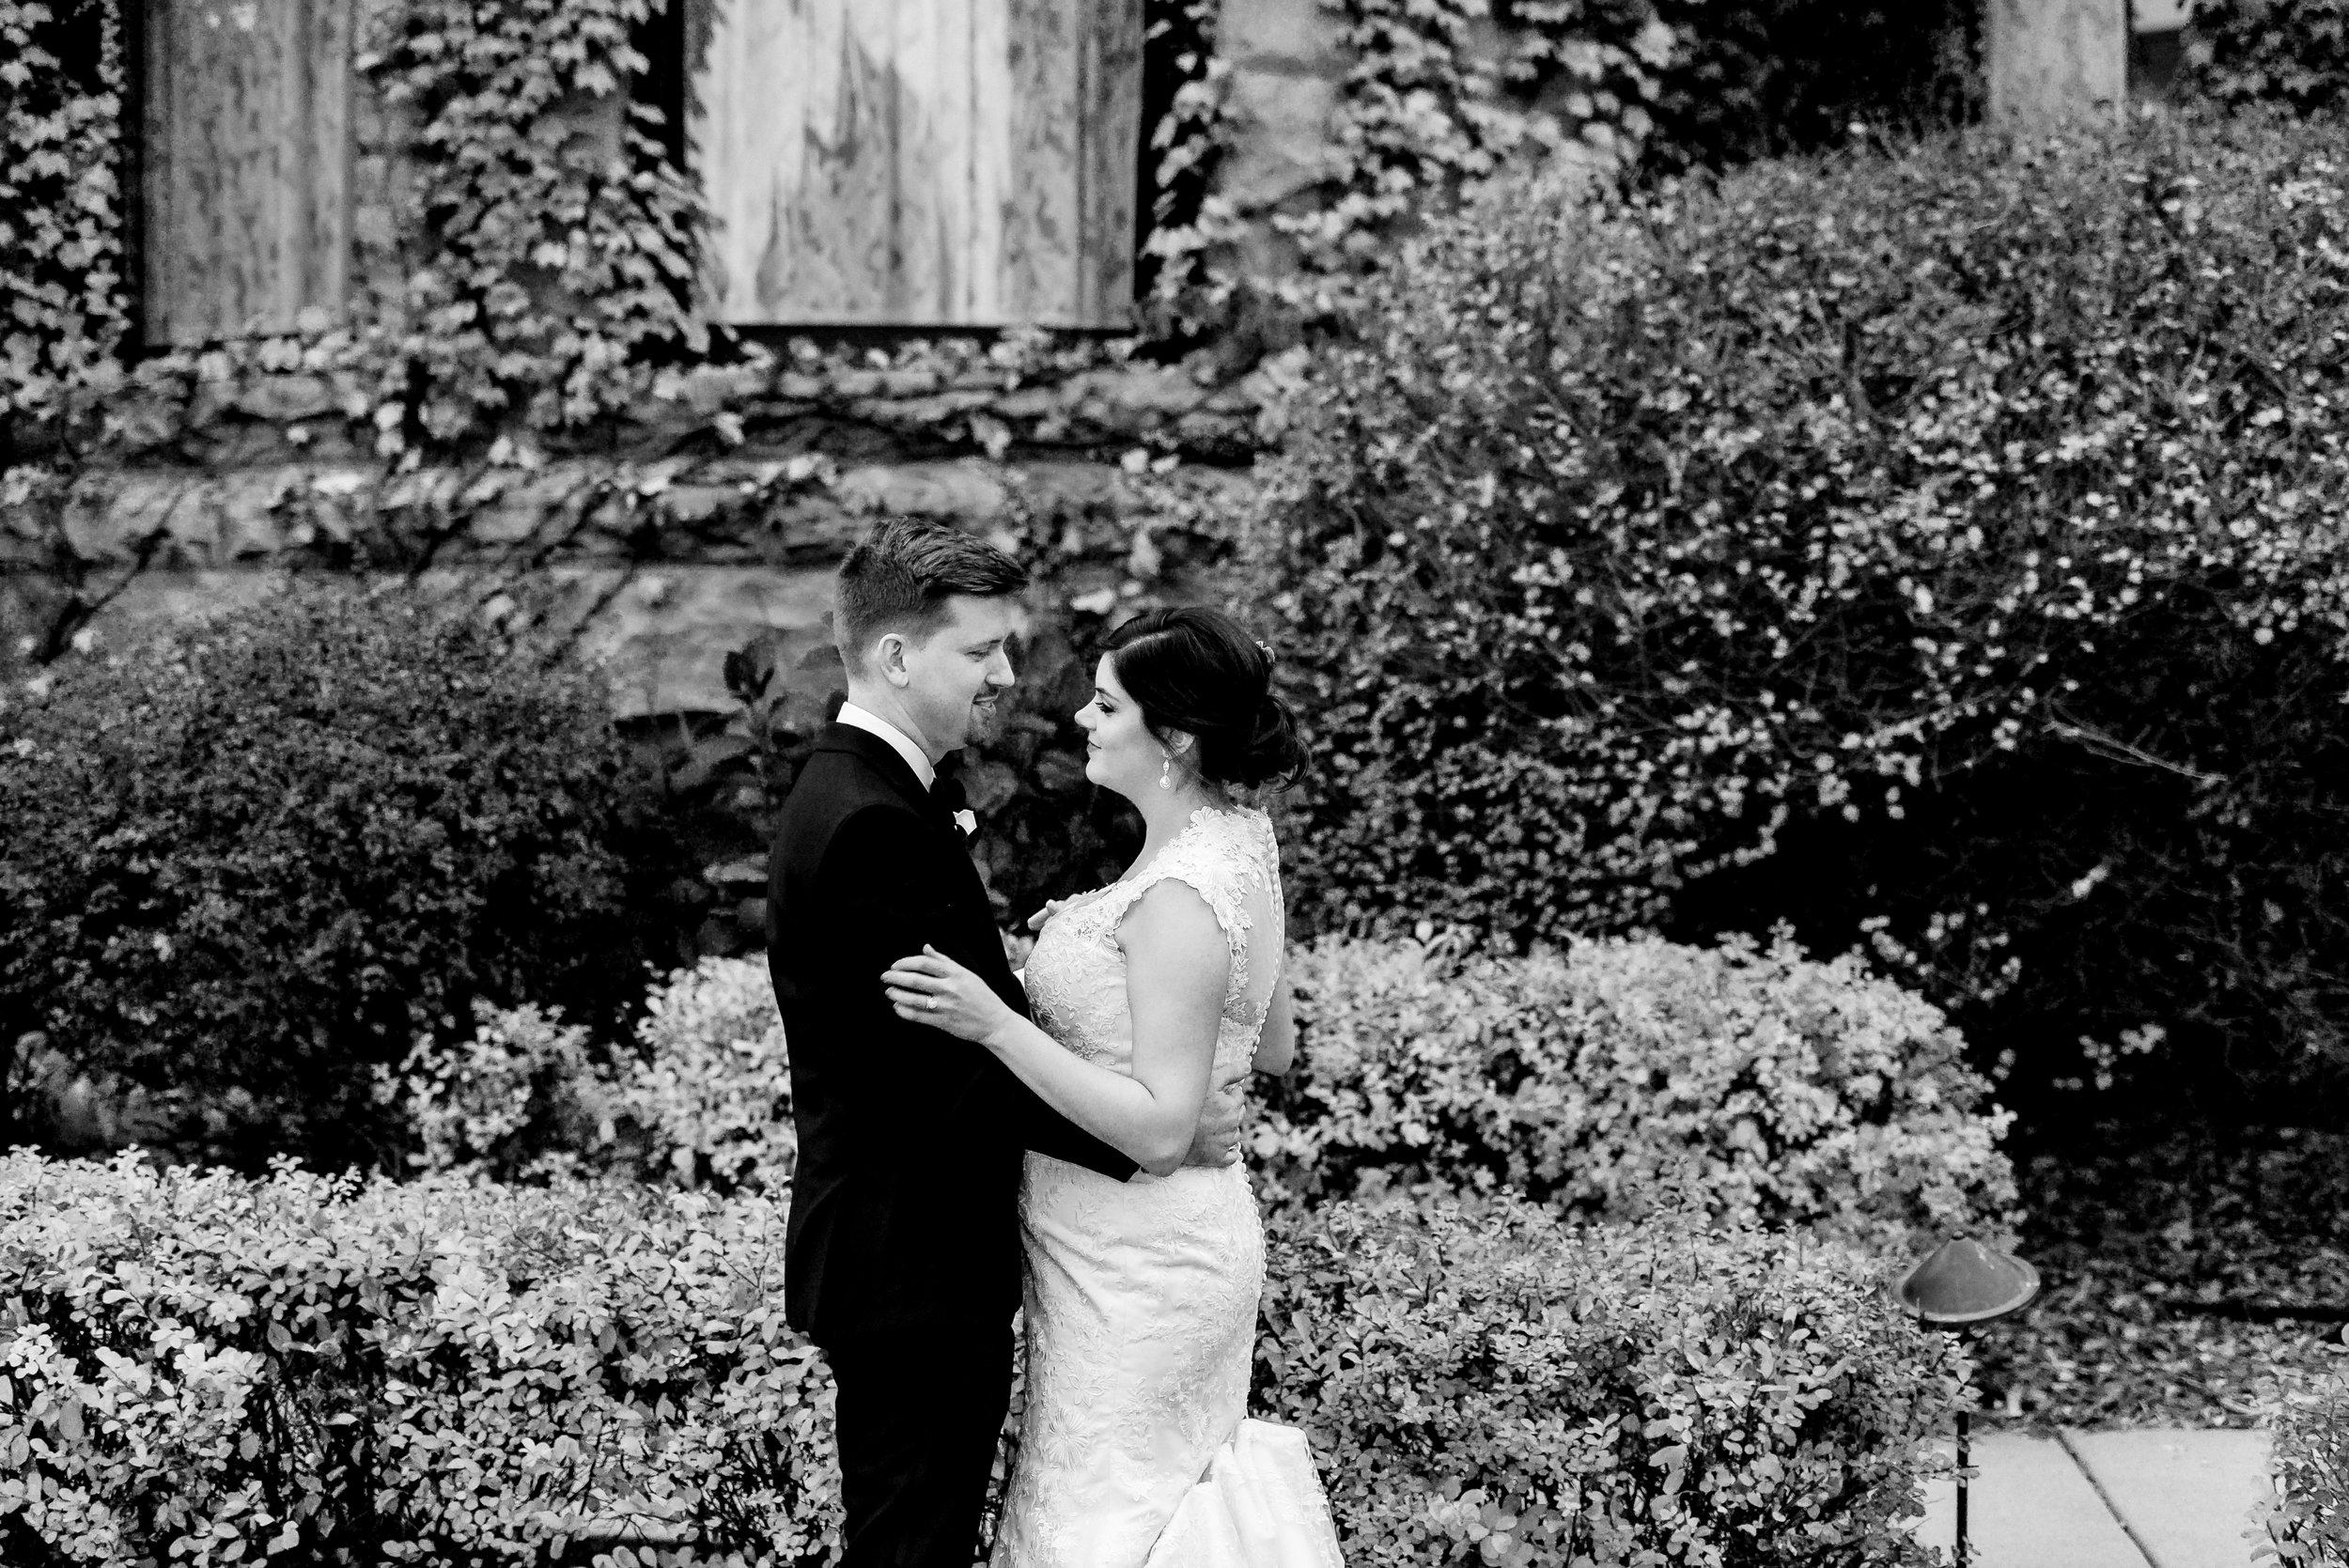 Lauren and Karl - Van Dusen Mansion Wedding and St. Olaf Catholic Church Minneapolis Wedding BW-697.jpg